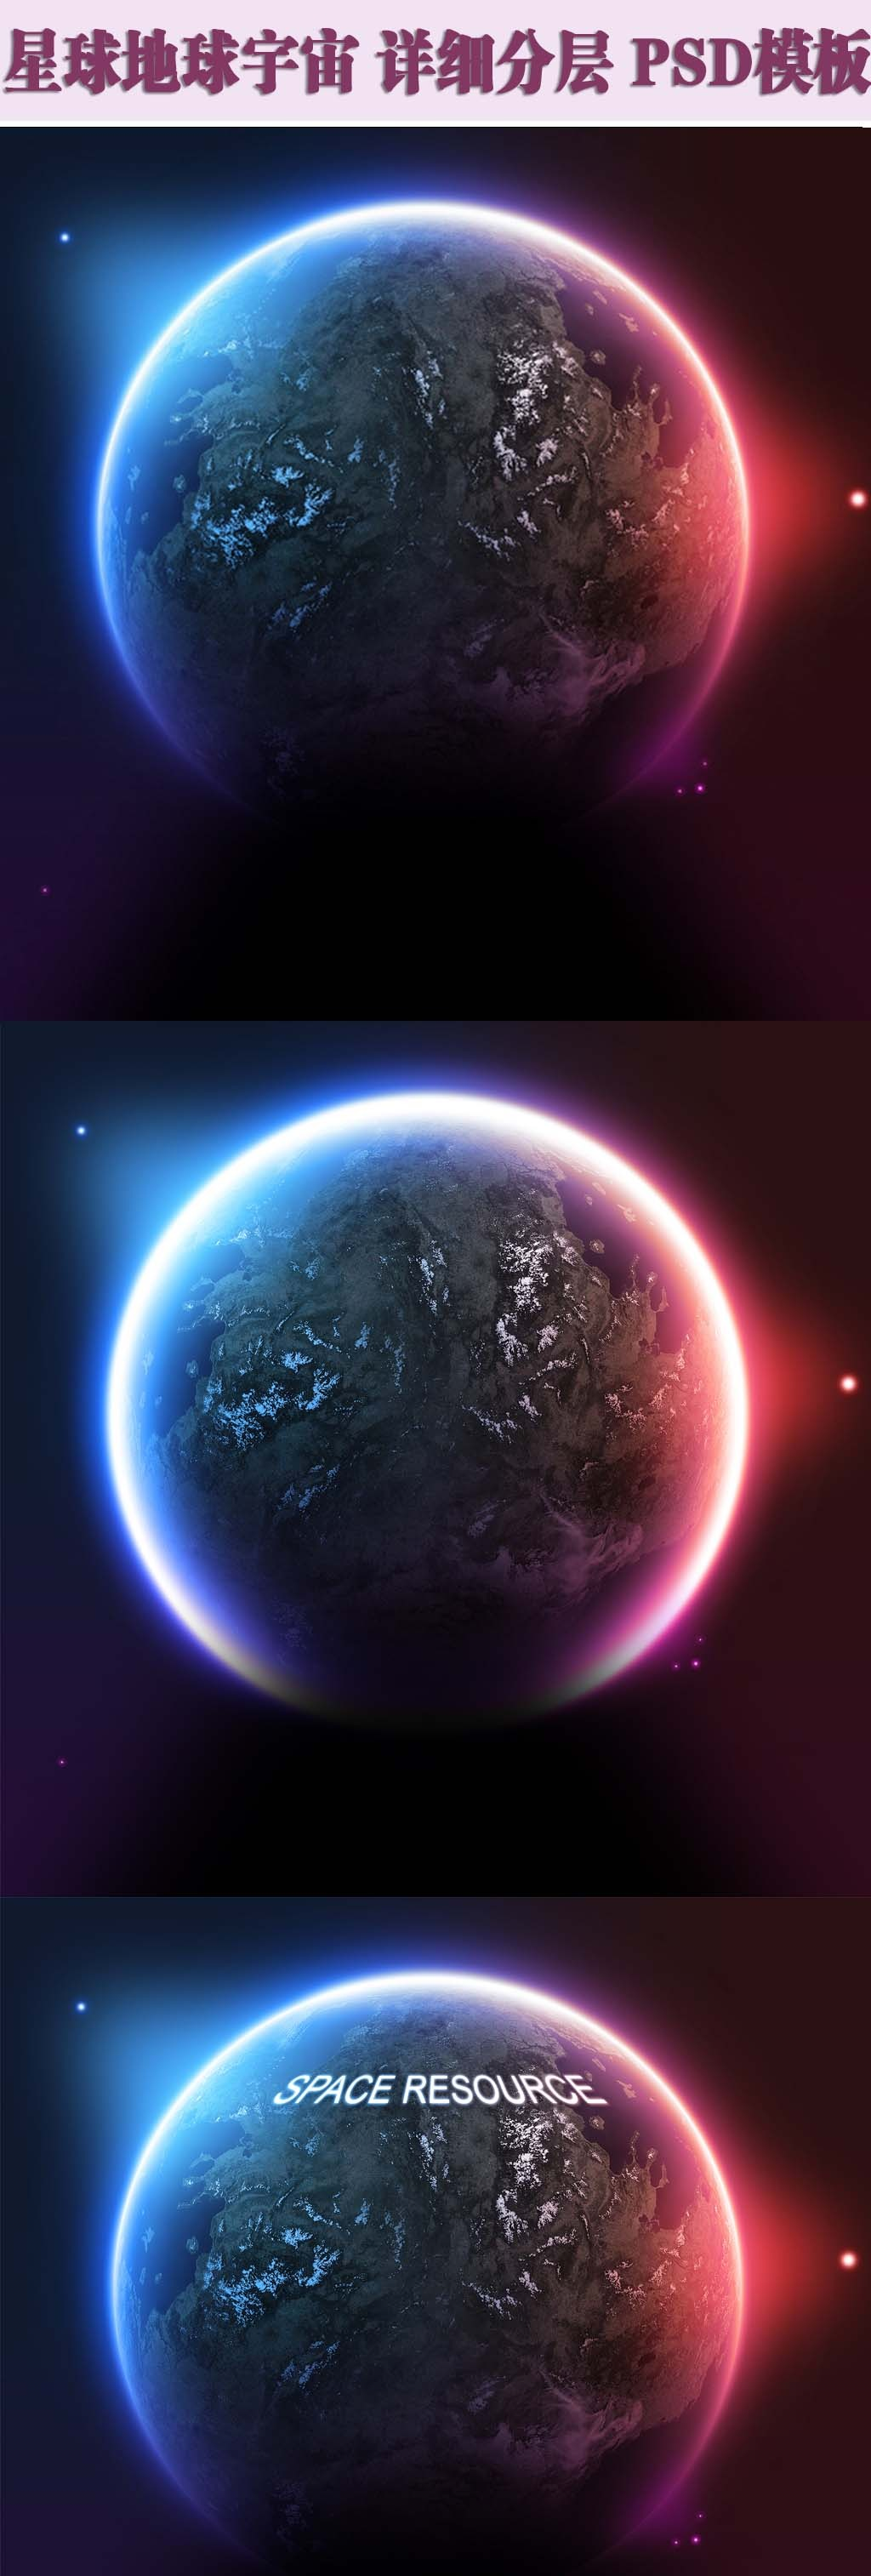 地球-海报大气背景